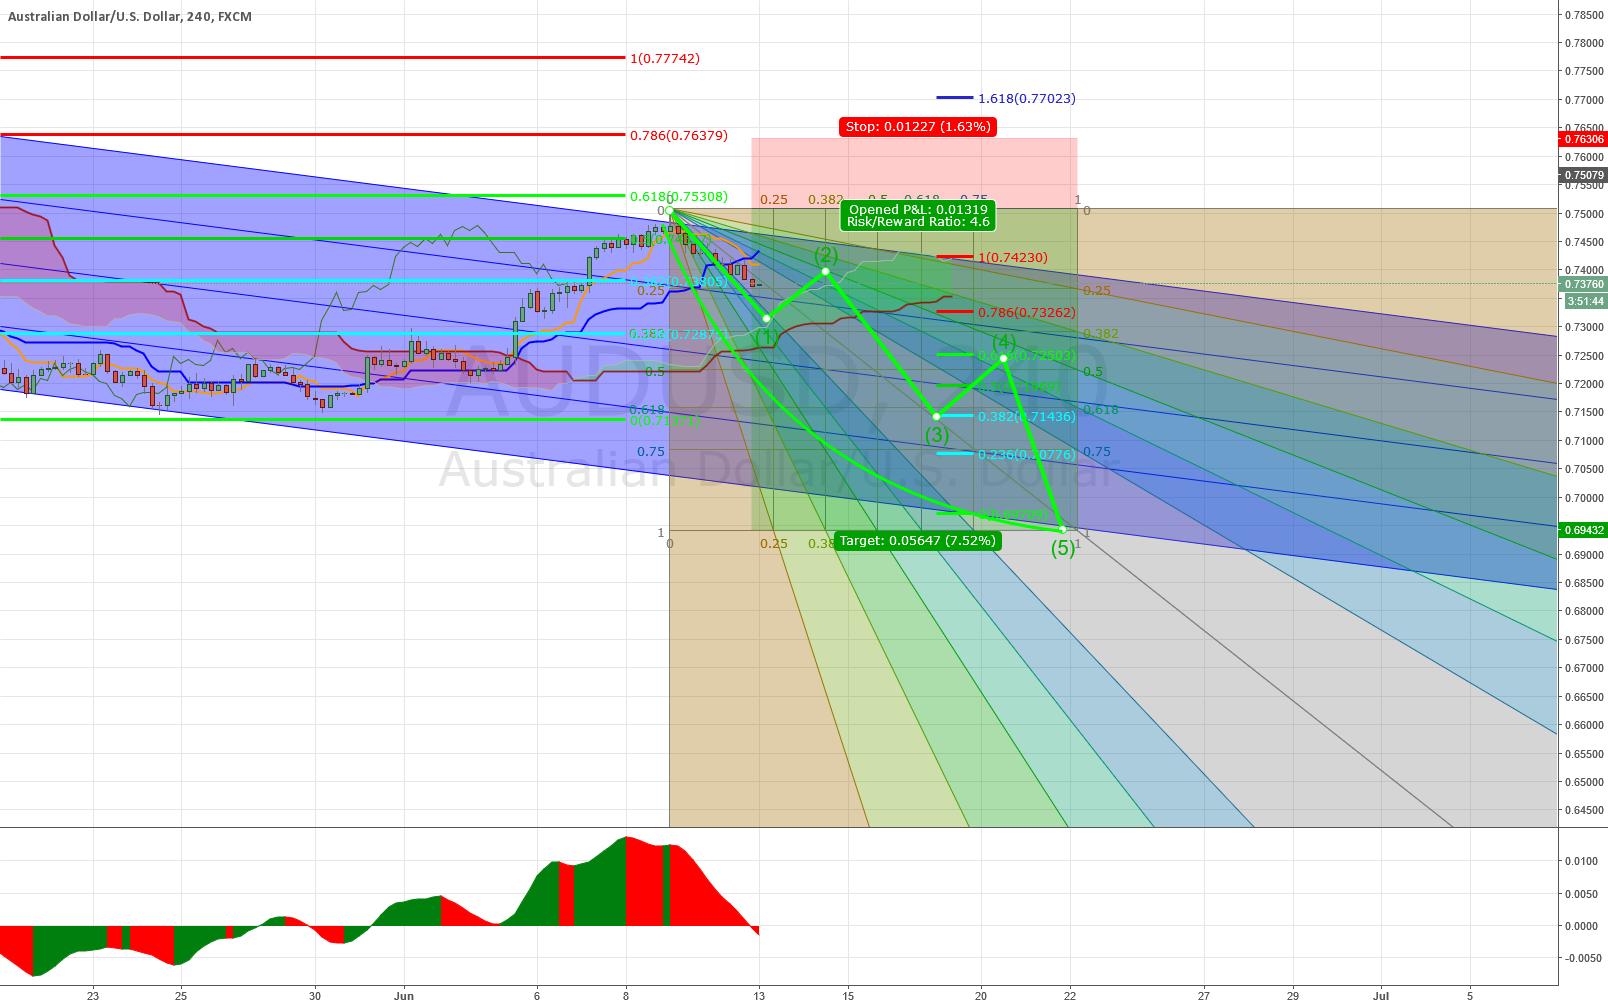 AUDUSD 4H Chart Analysis